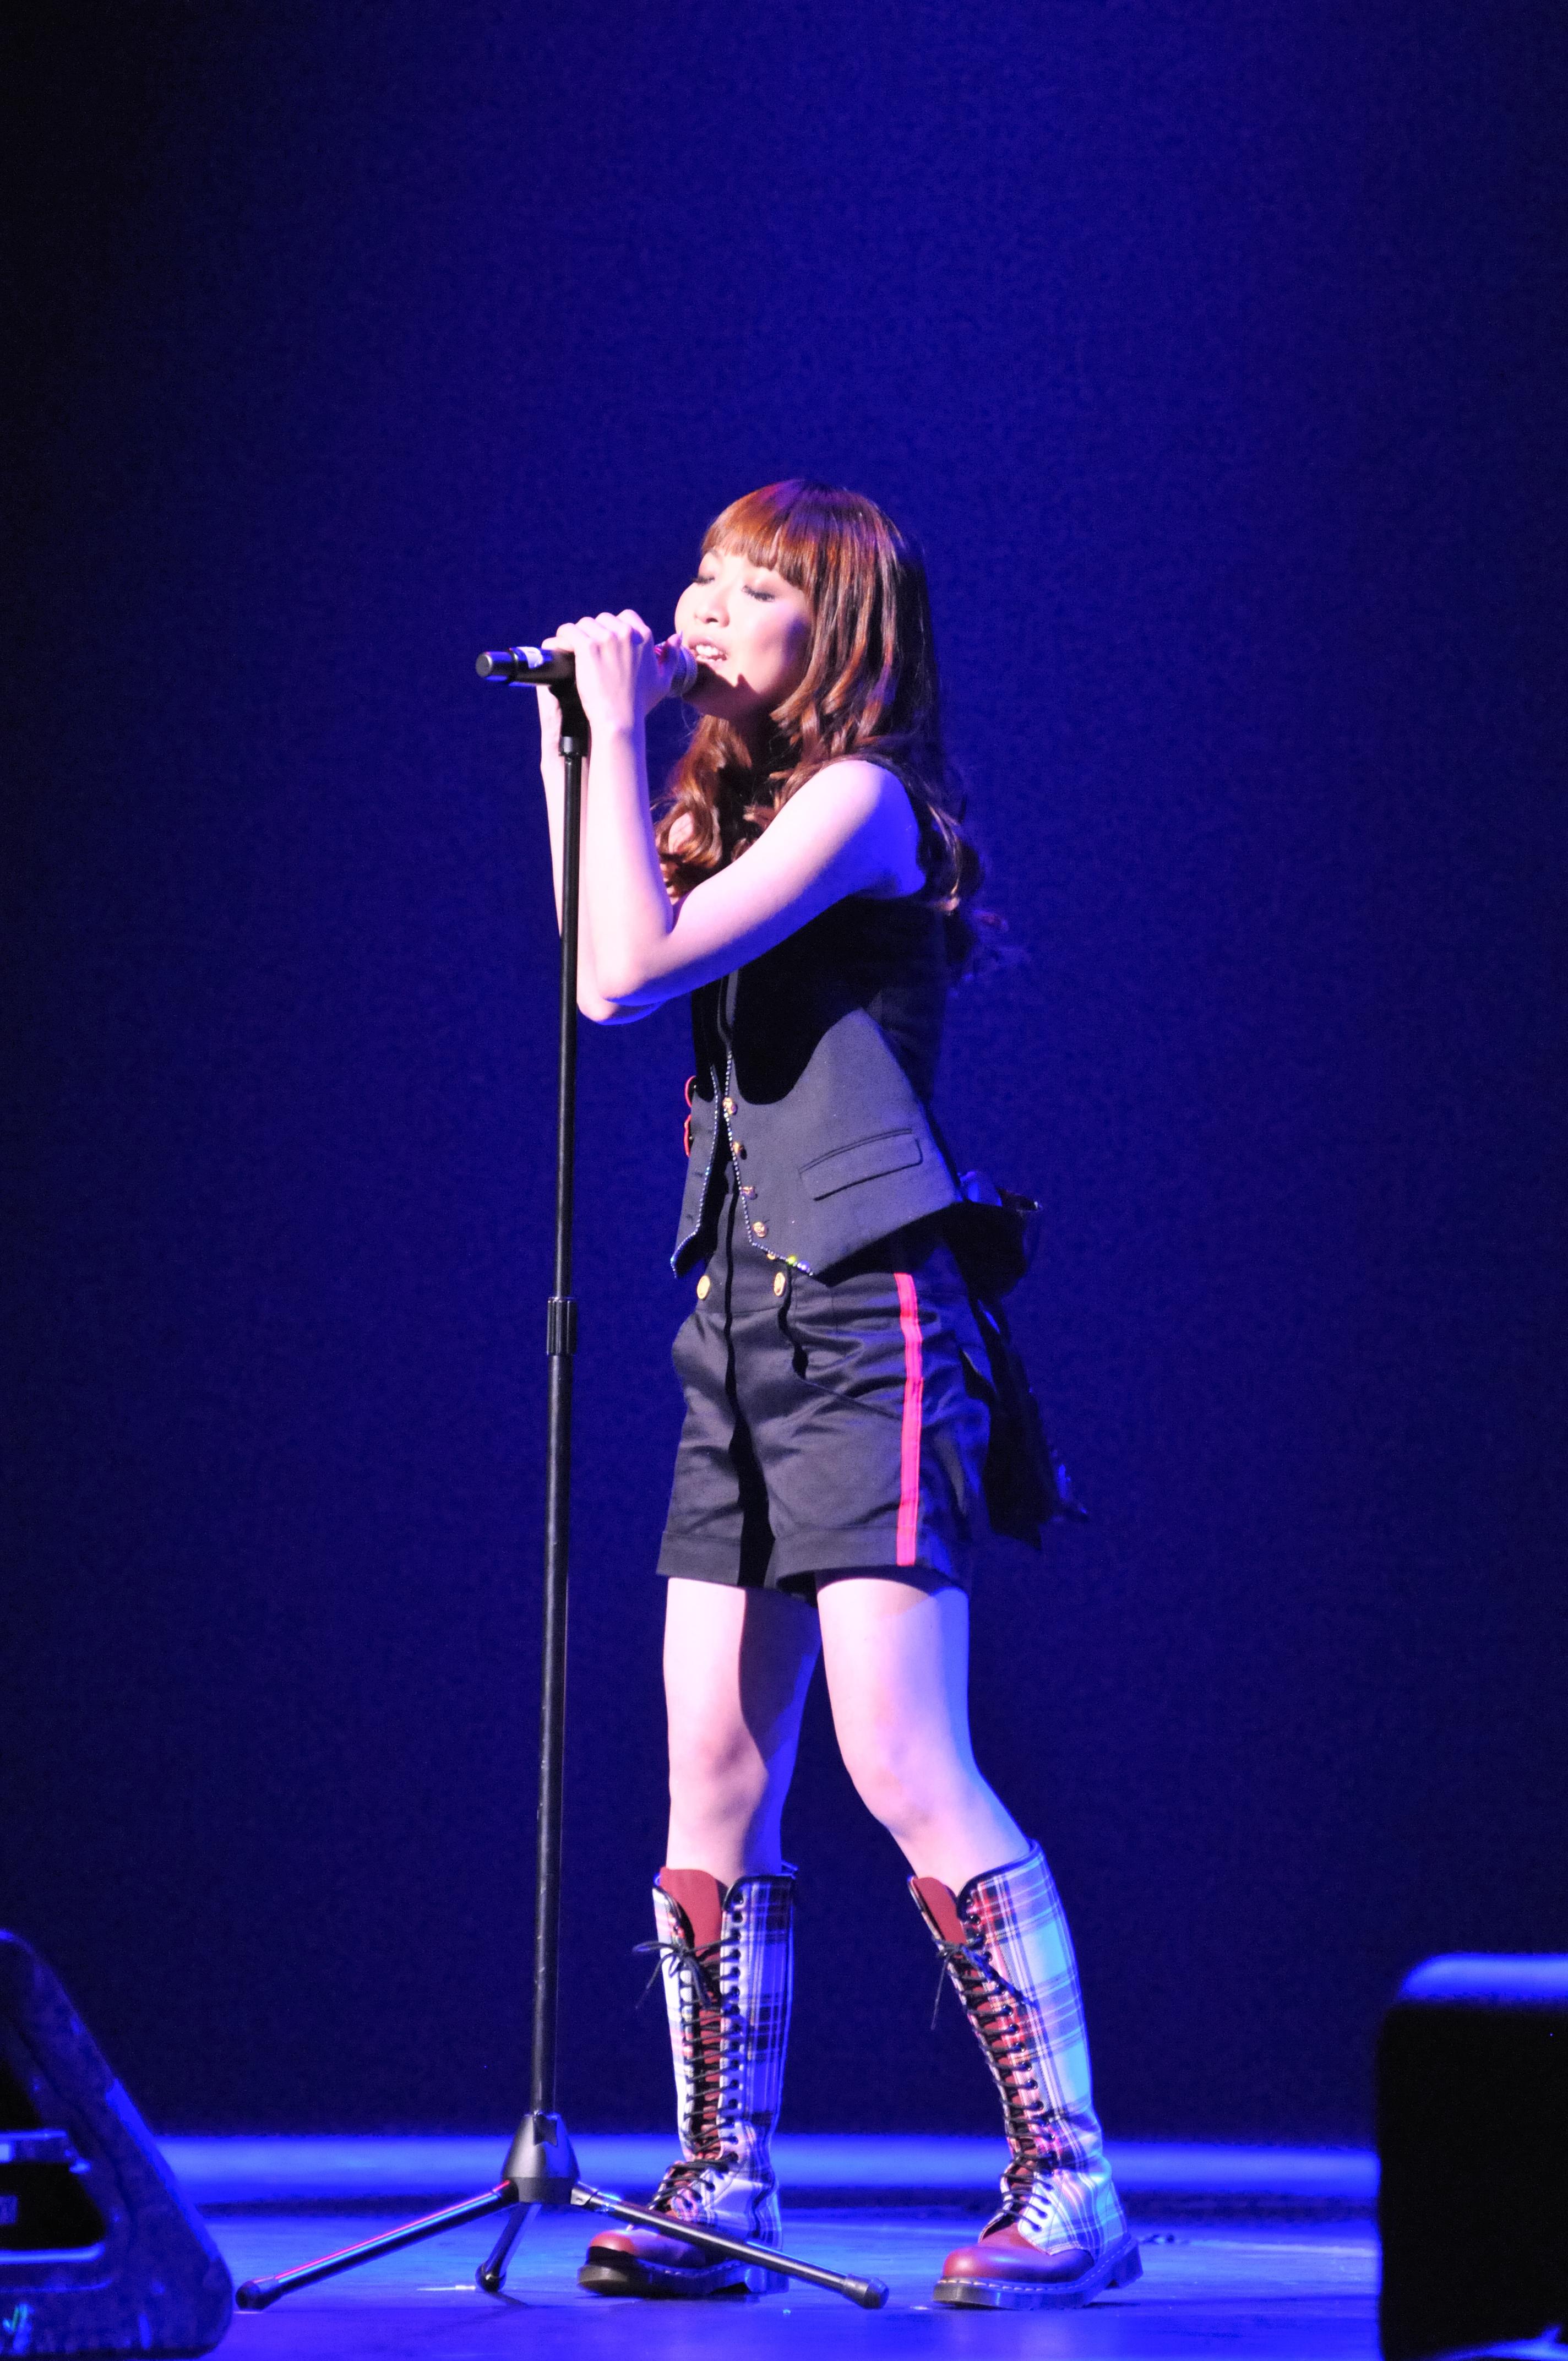 File:May'n performing at Nokia Theater LA Live.jpg